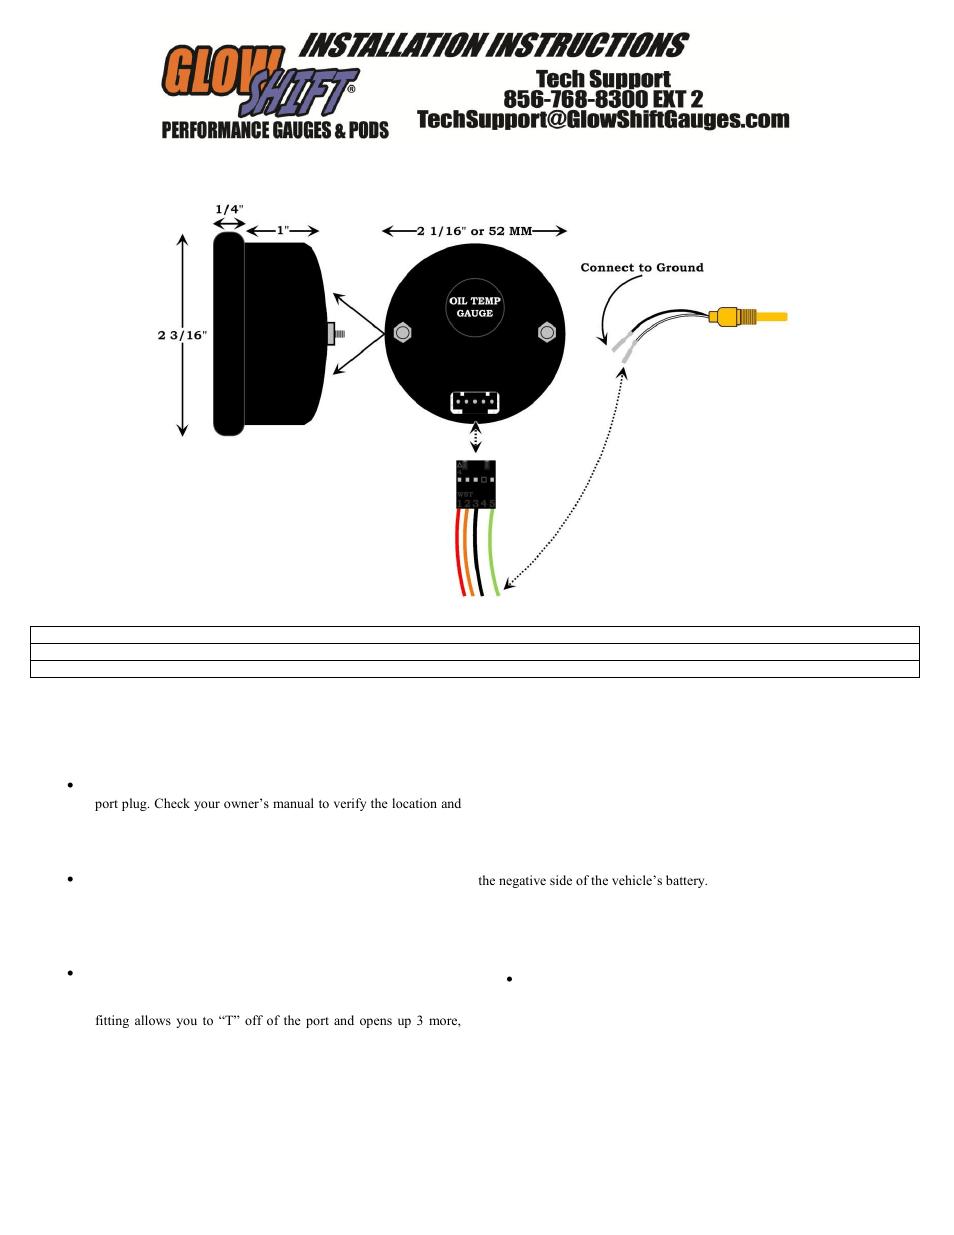 hight resolution of glowshift digital series celsius oil temperature gauge user manual